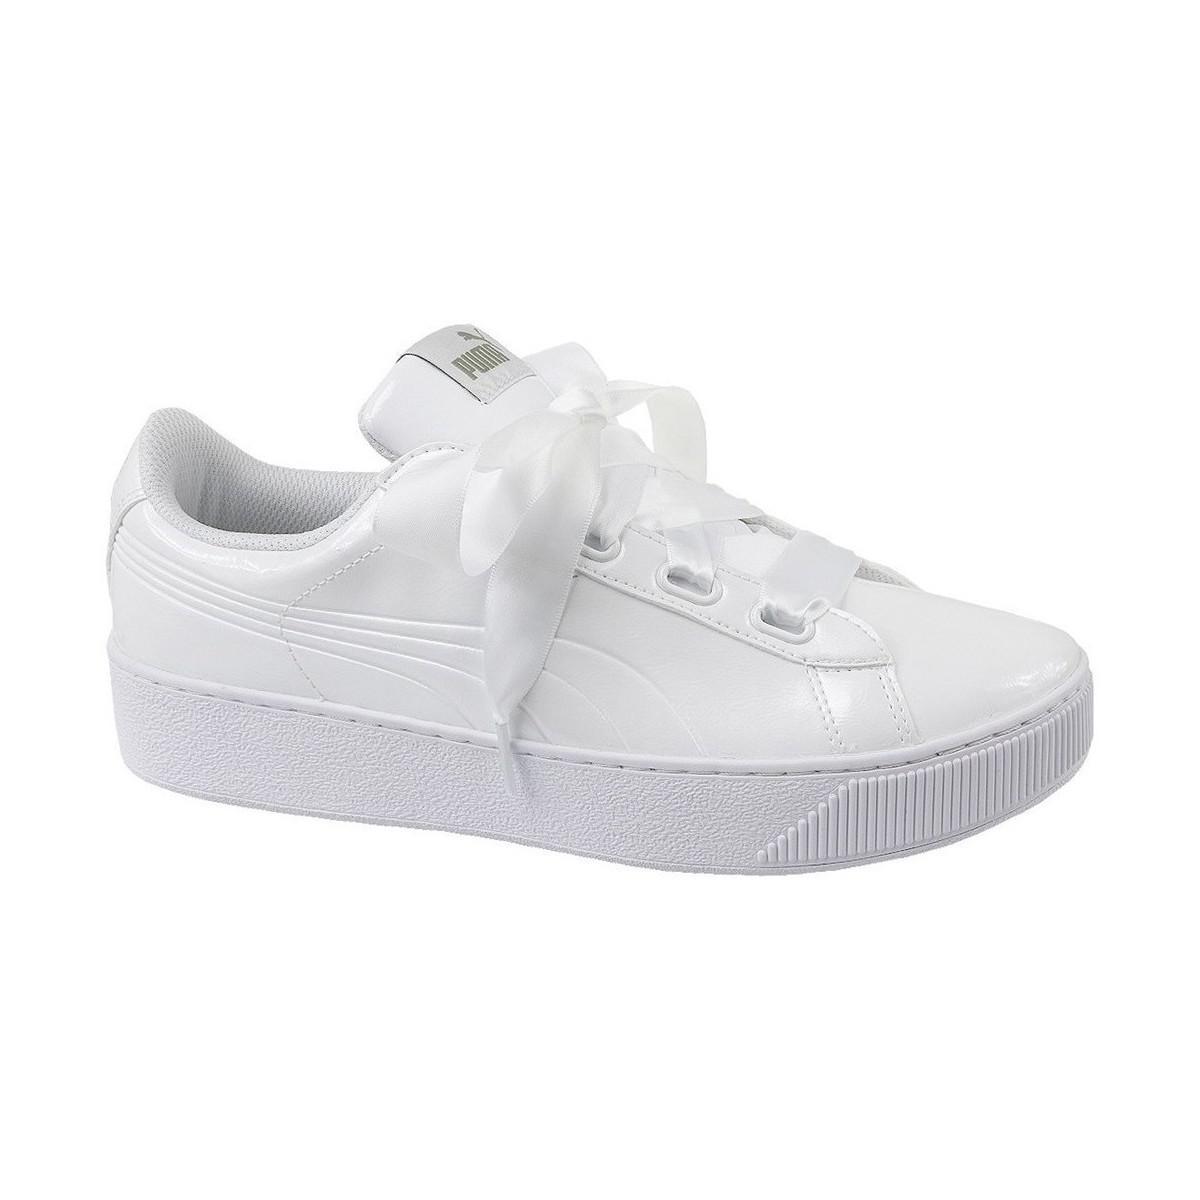 141e30e772d PUMA Vikky Platform Ribbon Women s Shoes (trainers) In White in ...